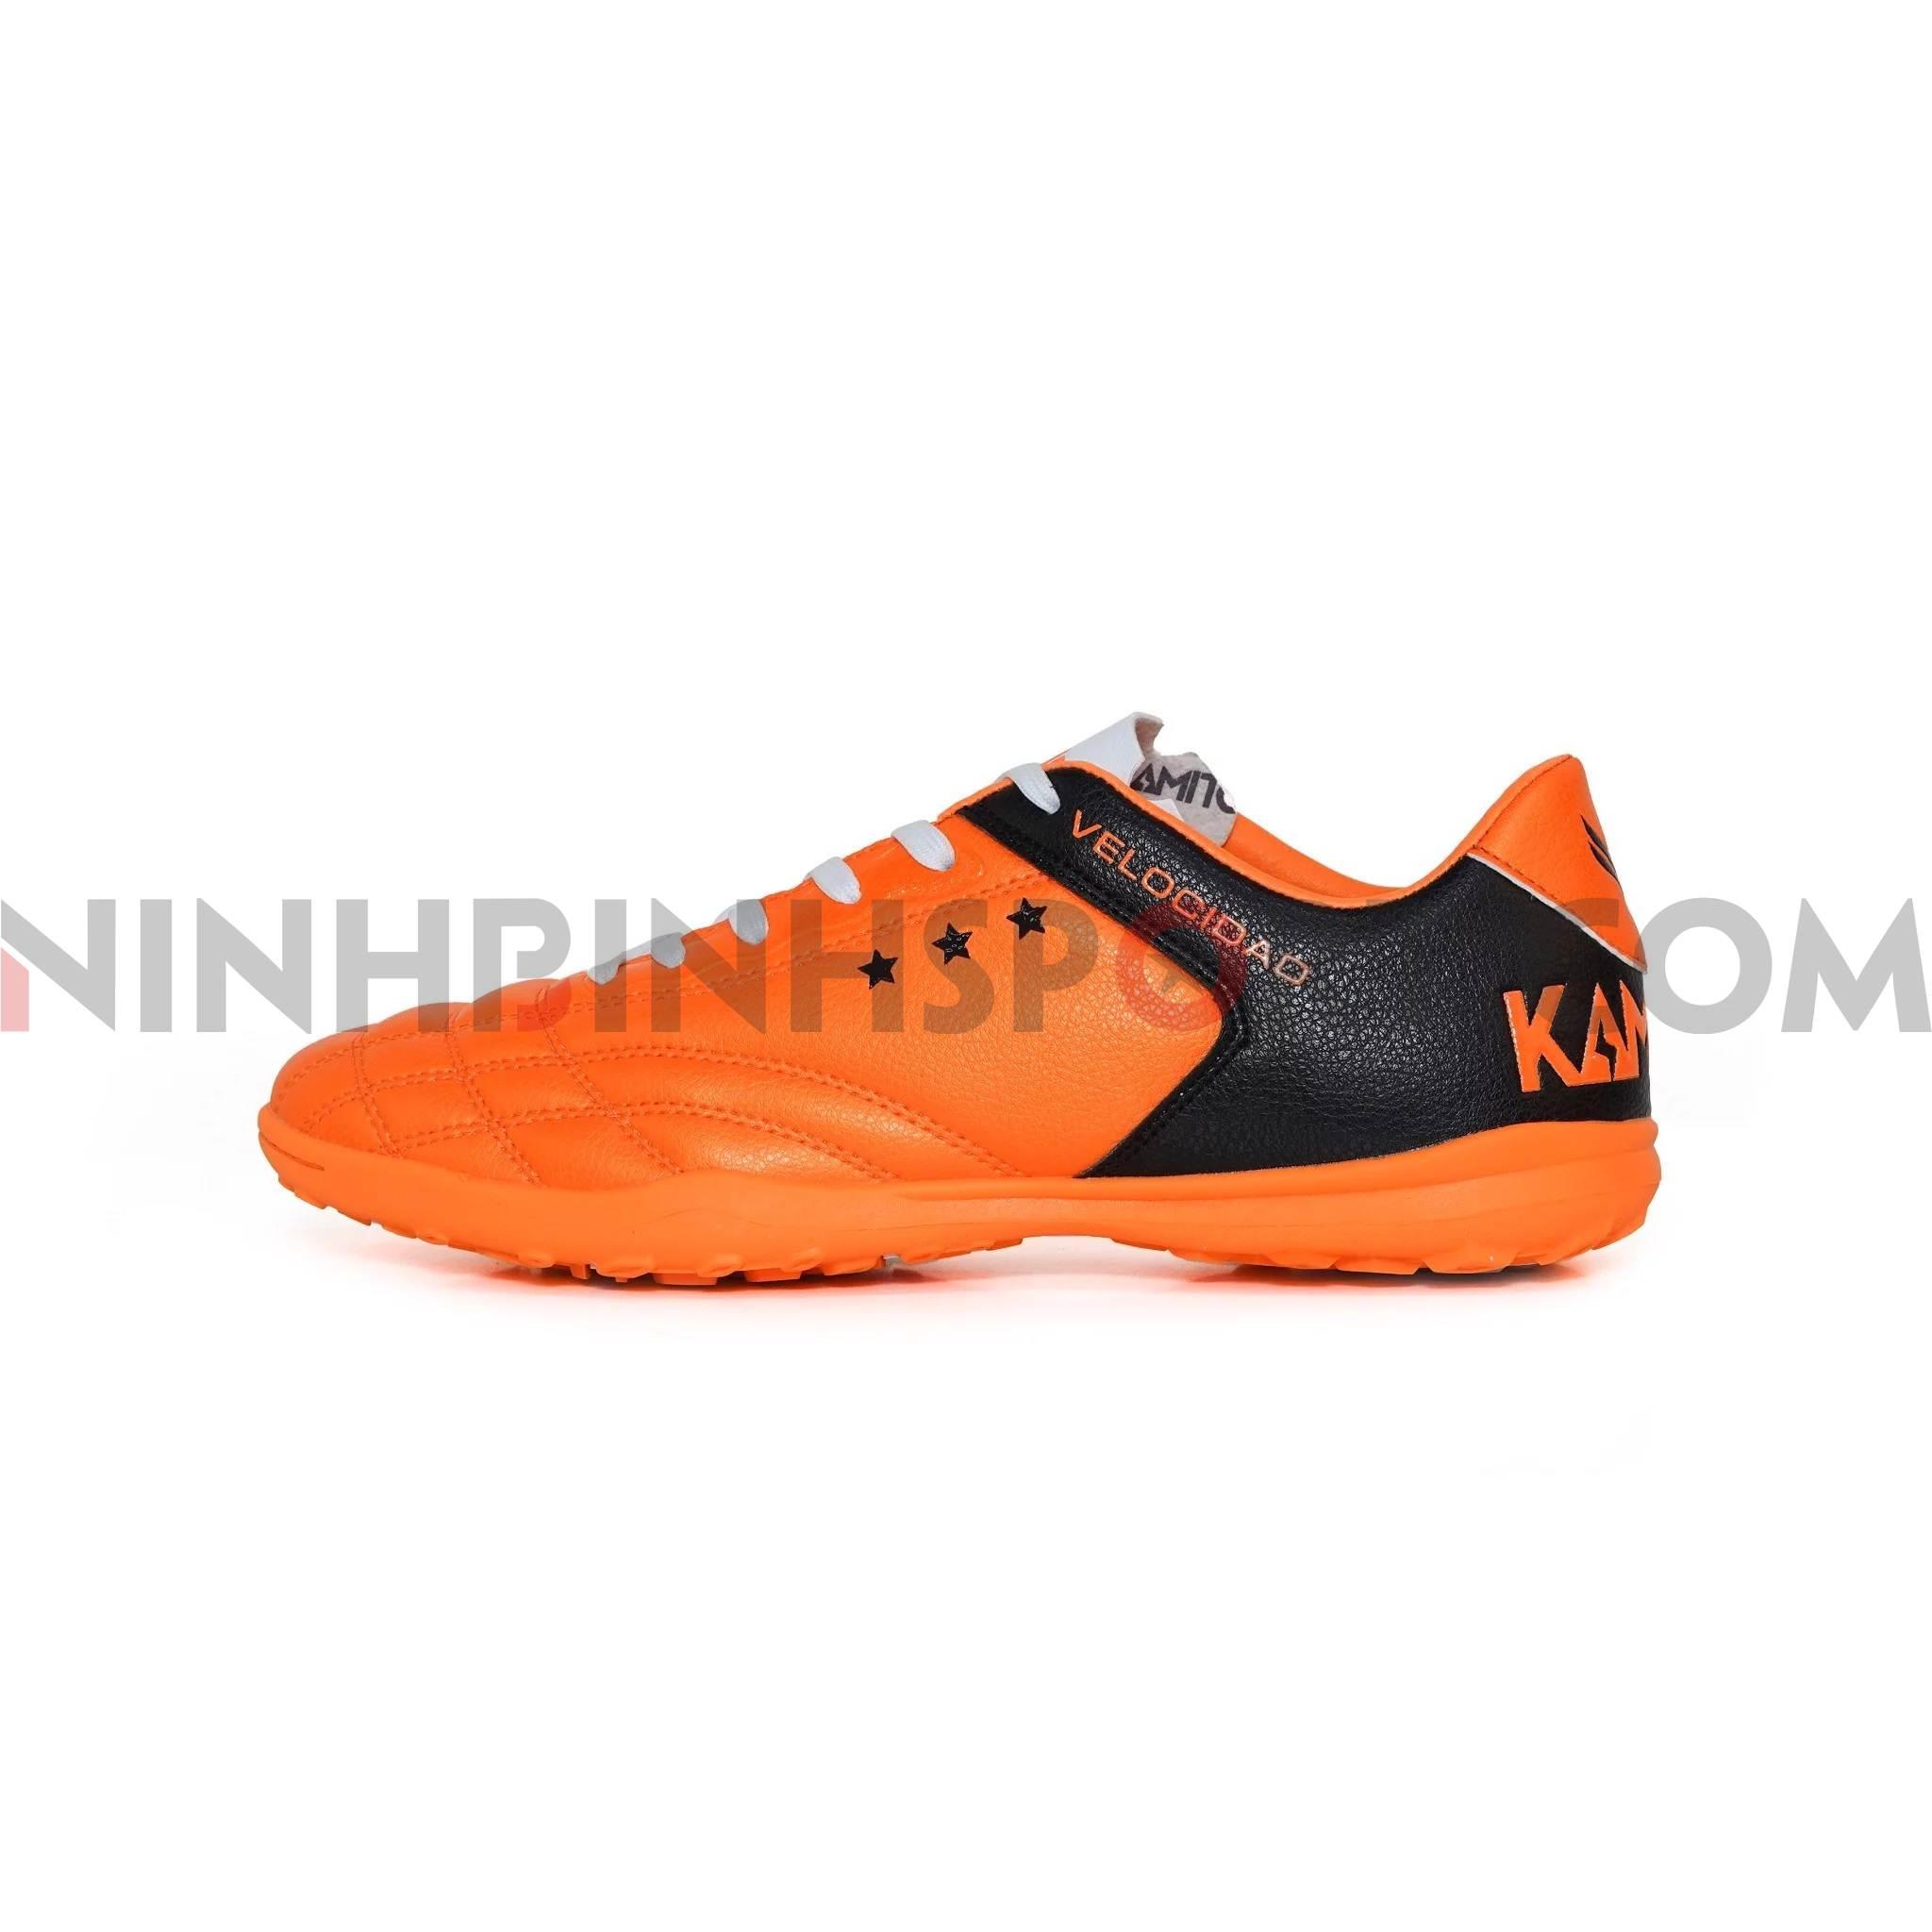 Giầy bóng đá nam Kamito Velocidad 3 F19705